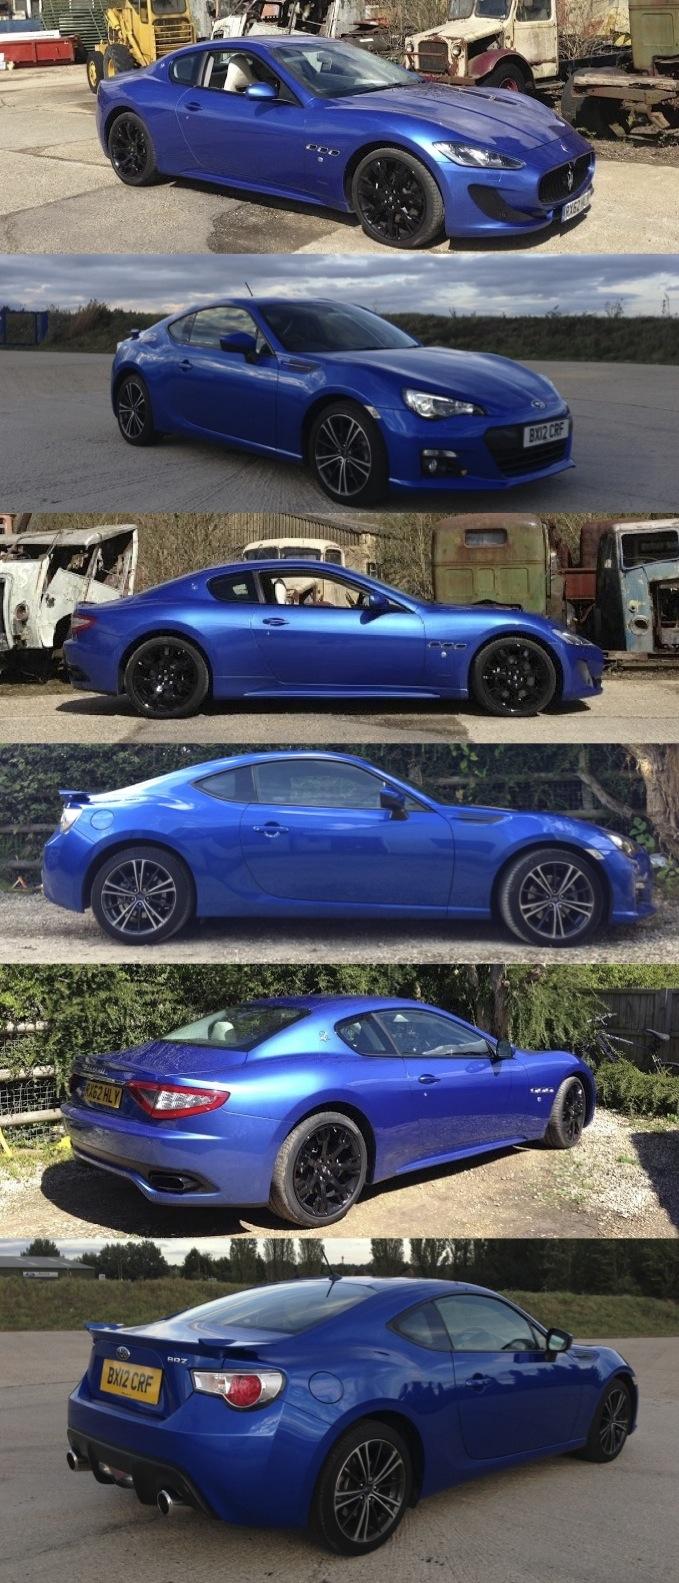 Subaru BRZ Maserati GranTurismo